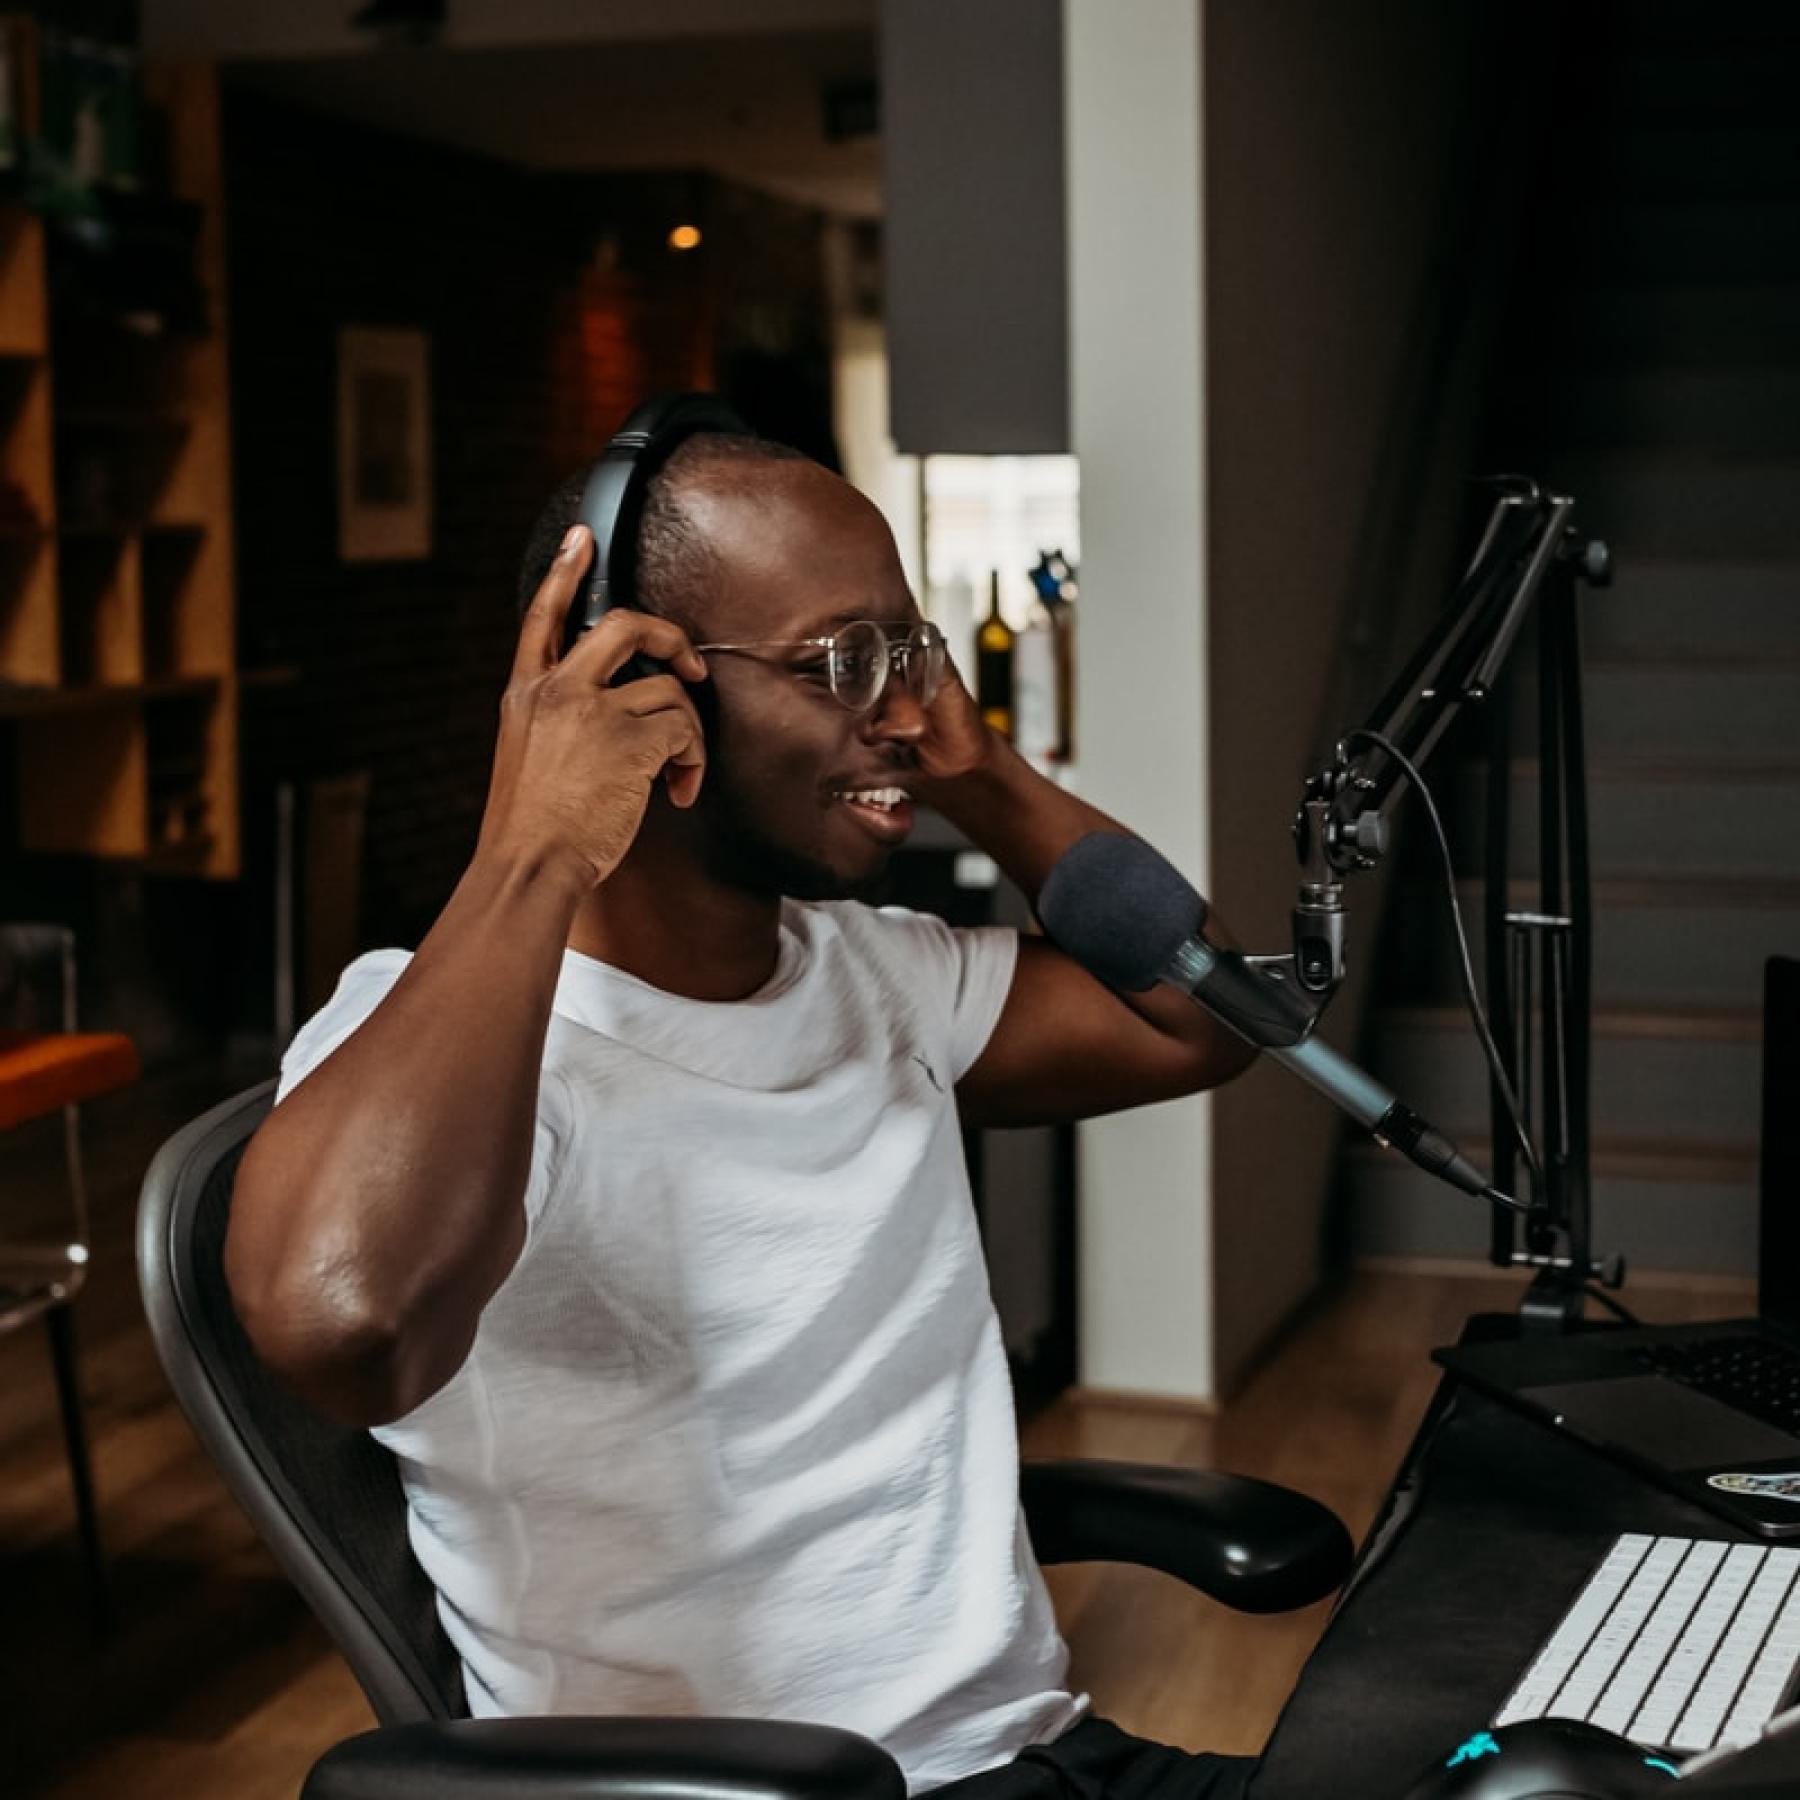 A creator recording a podcast.